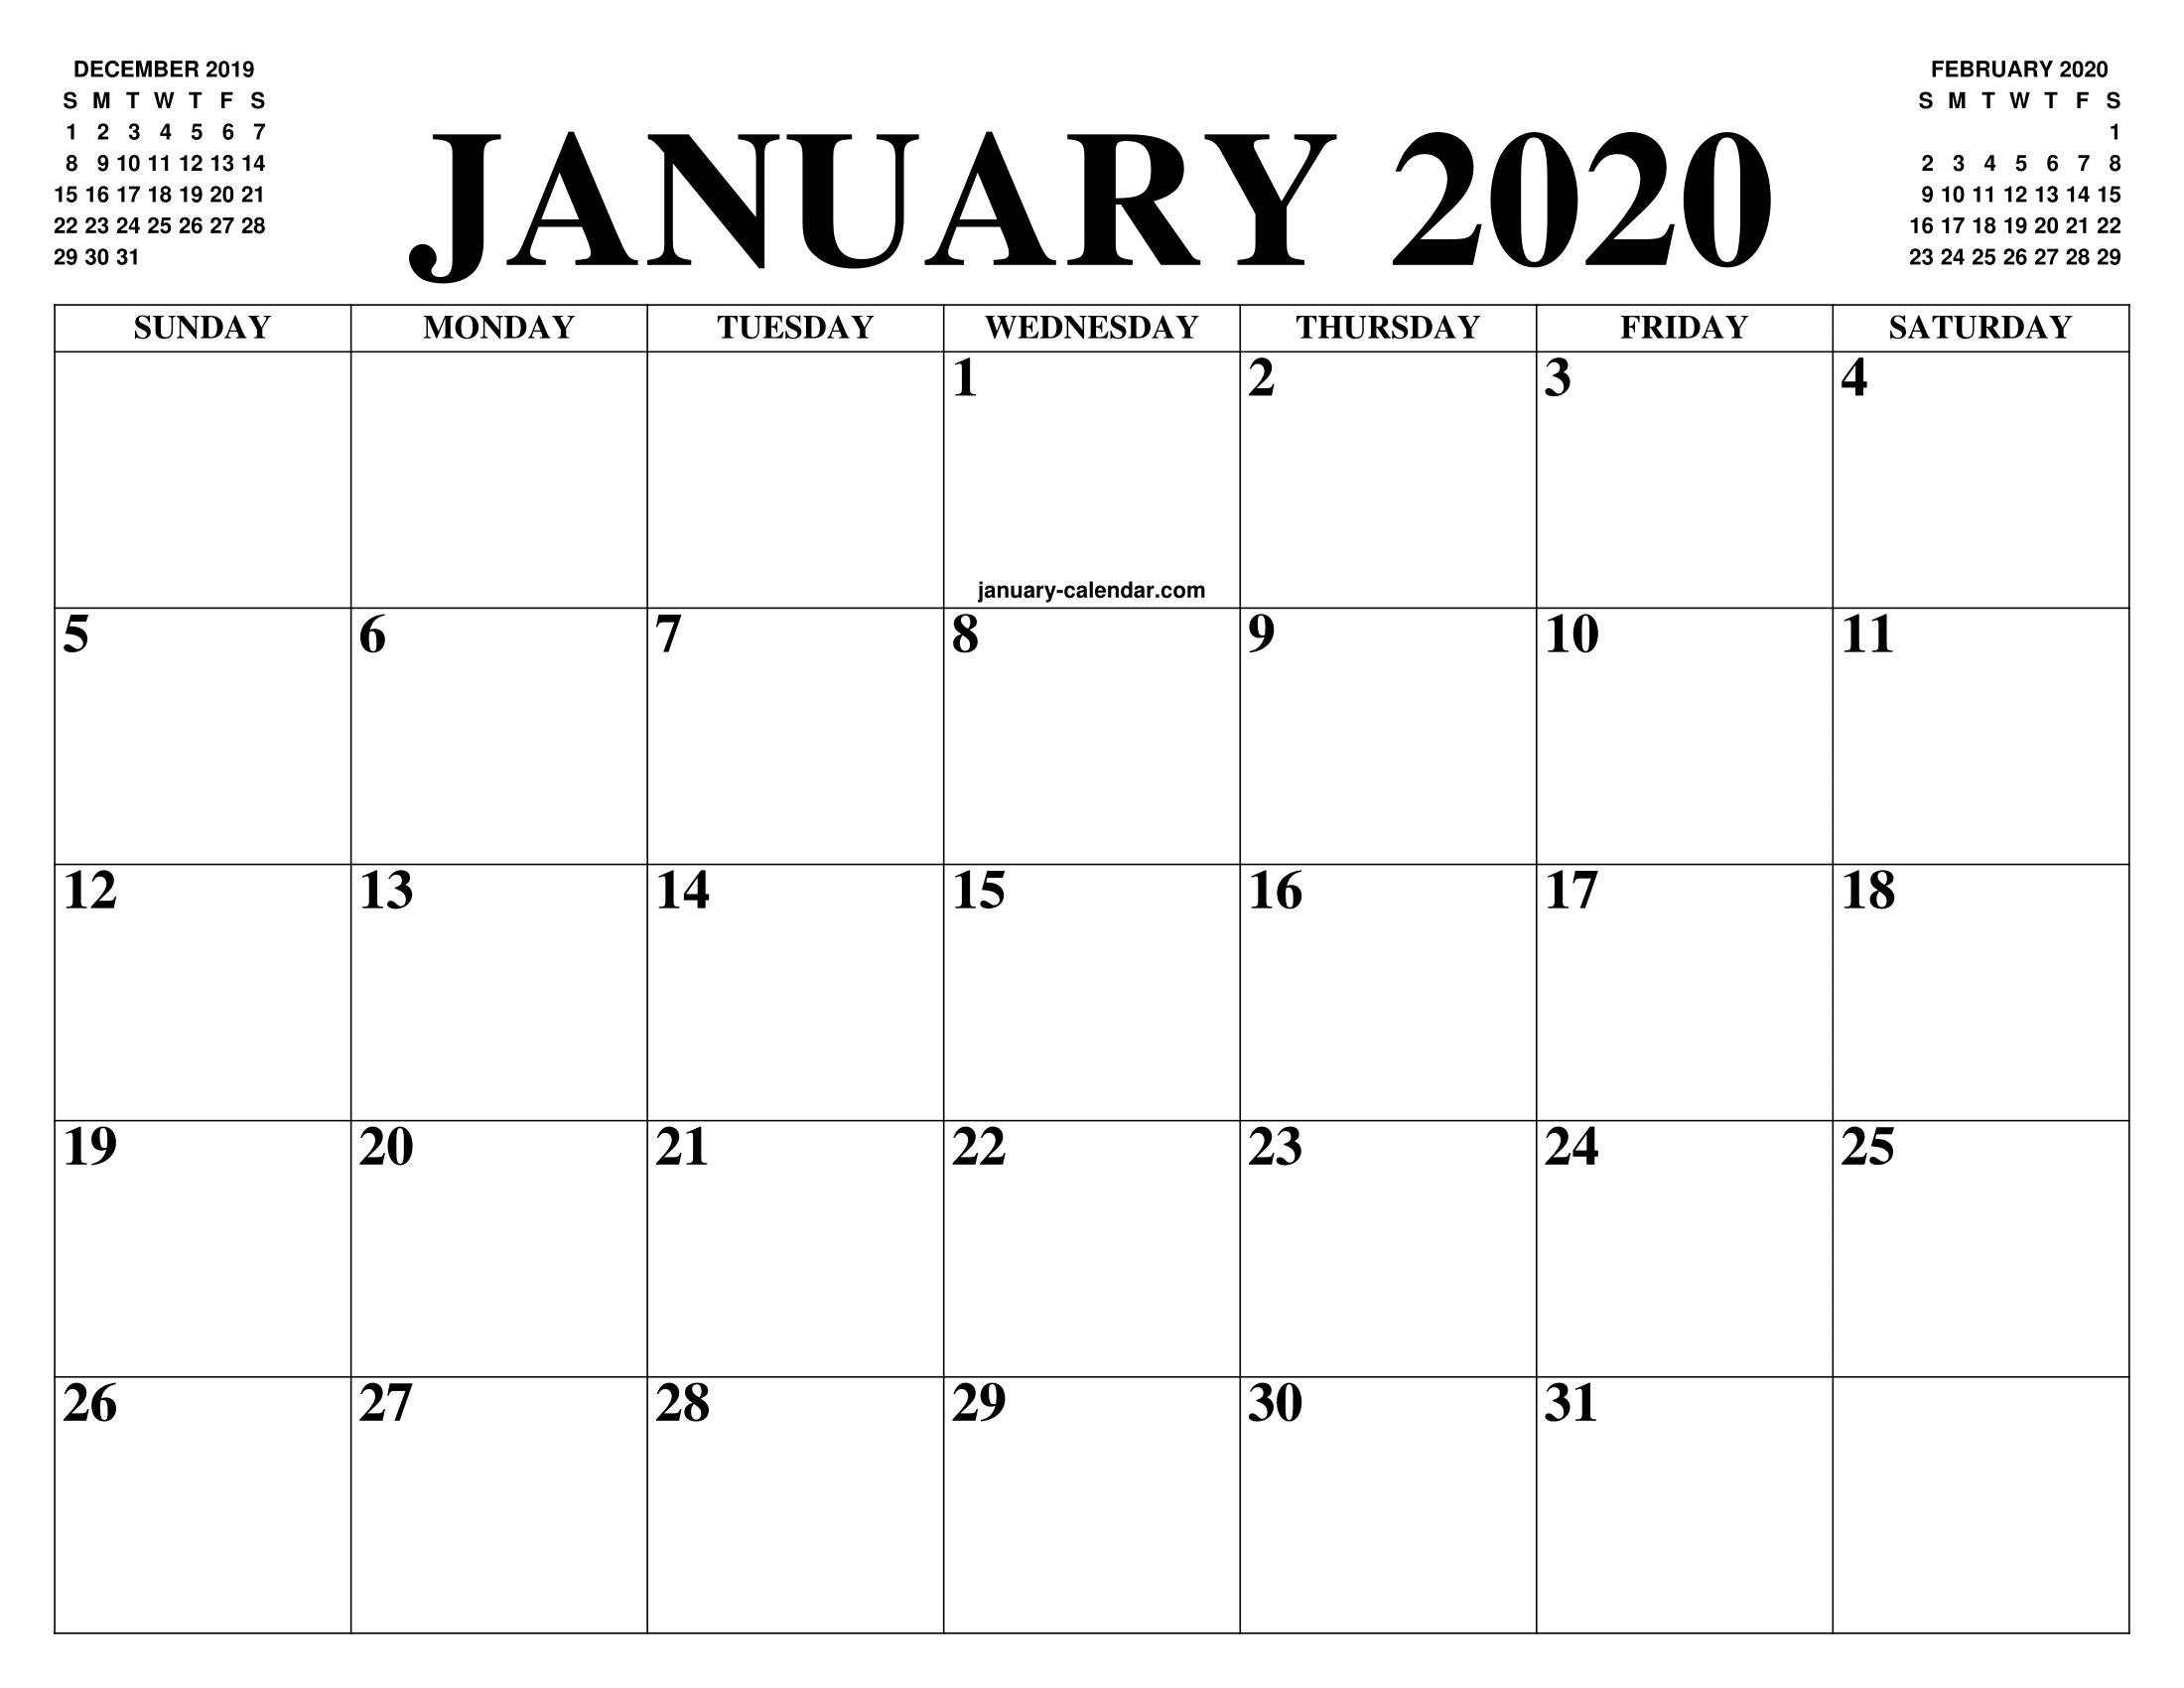 Pintipsographic On Free Templates | Calendars | January within Google Free Printable Calendars 2020